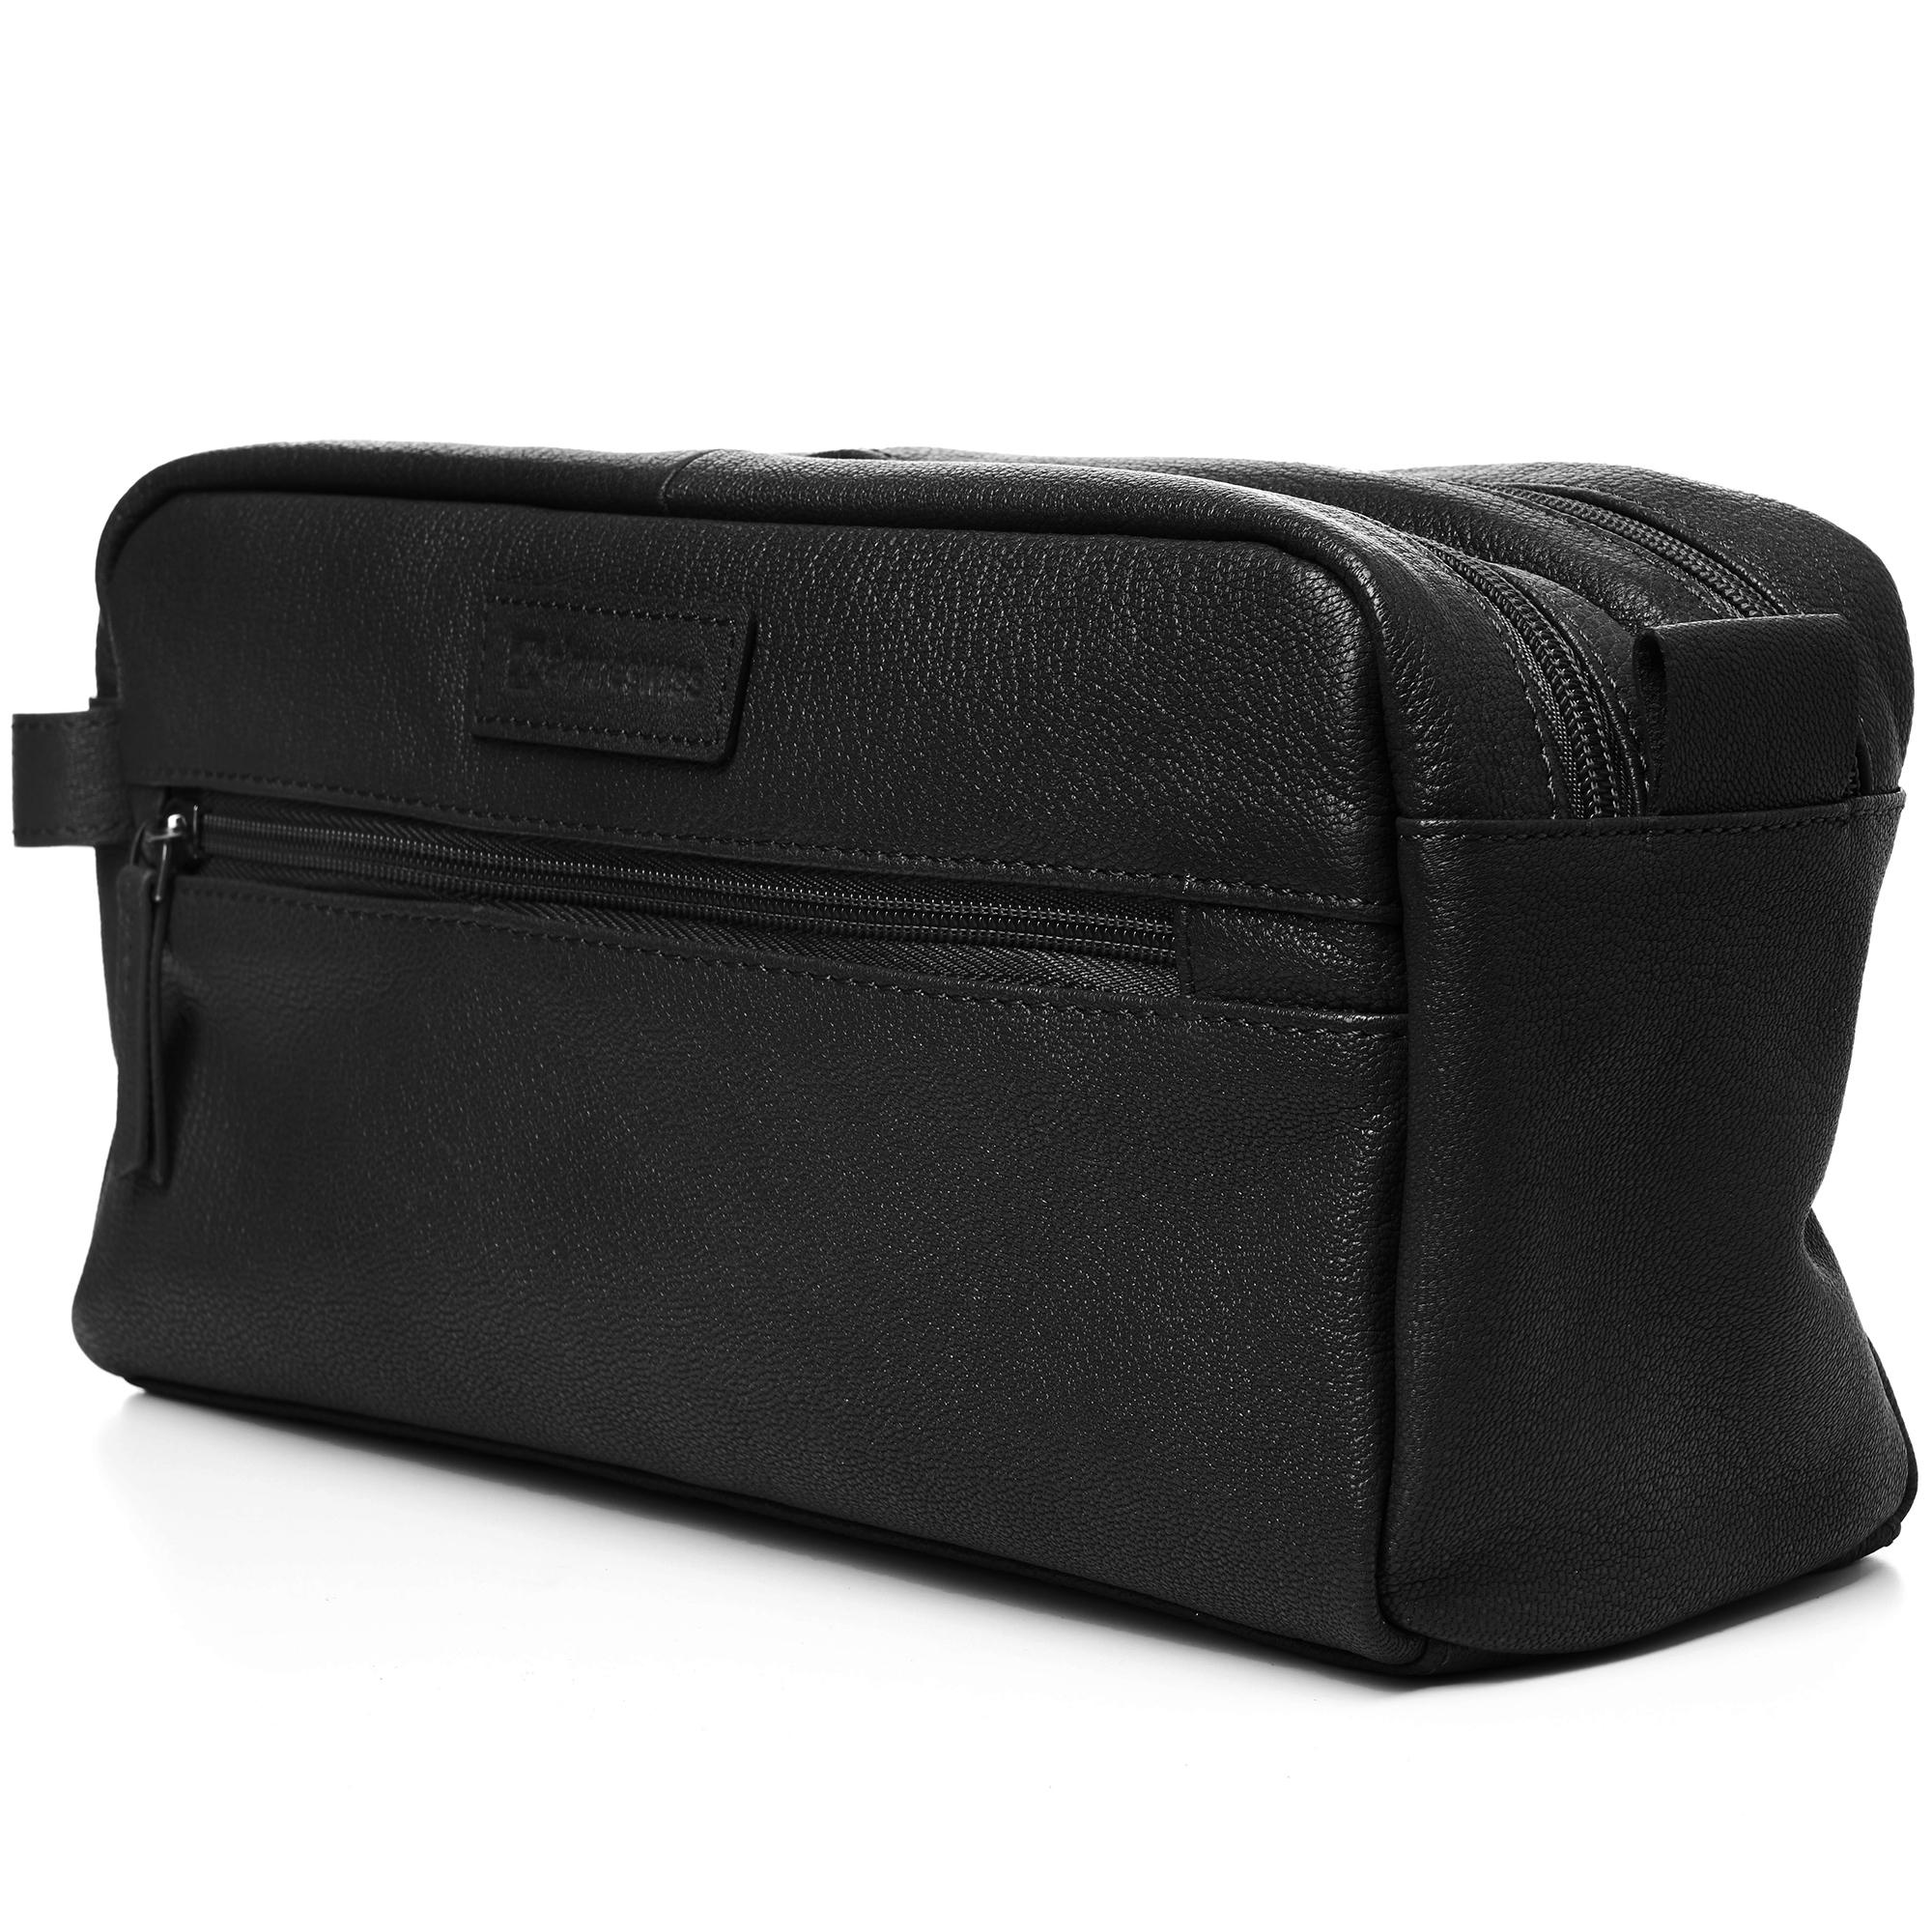 AlpineSwiss-Sedona-Toiletry-Bag-Genuine-Leather-Shaving-Kit-Dopp-Kit-Travel-Case thumbnail 15